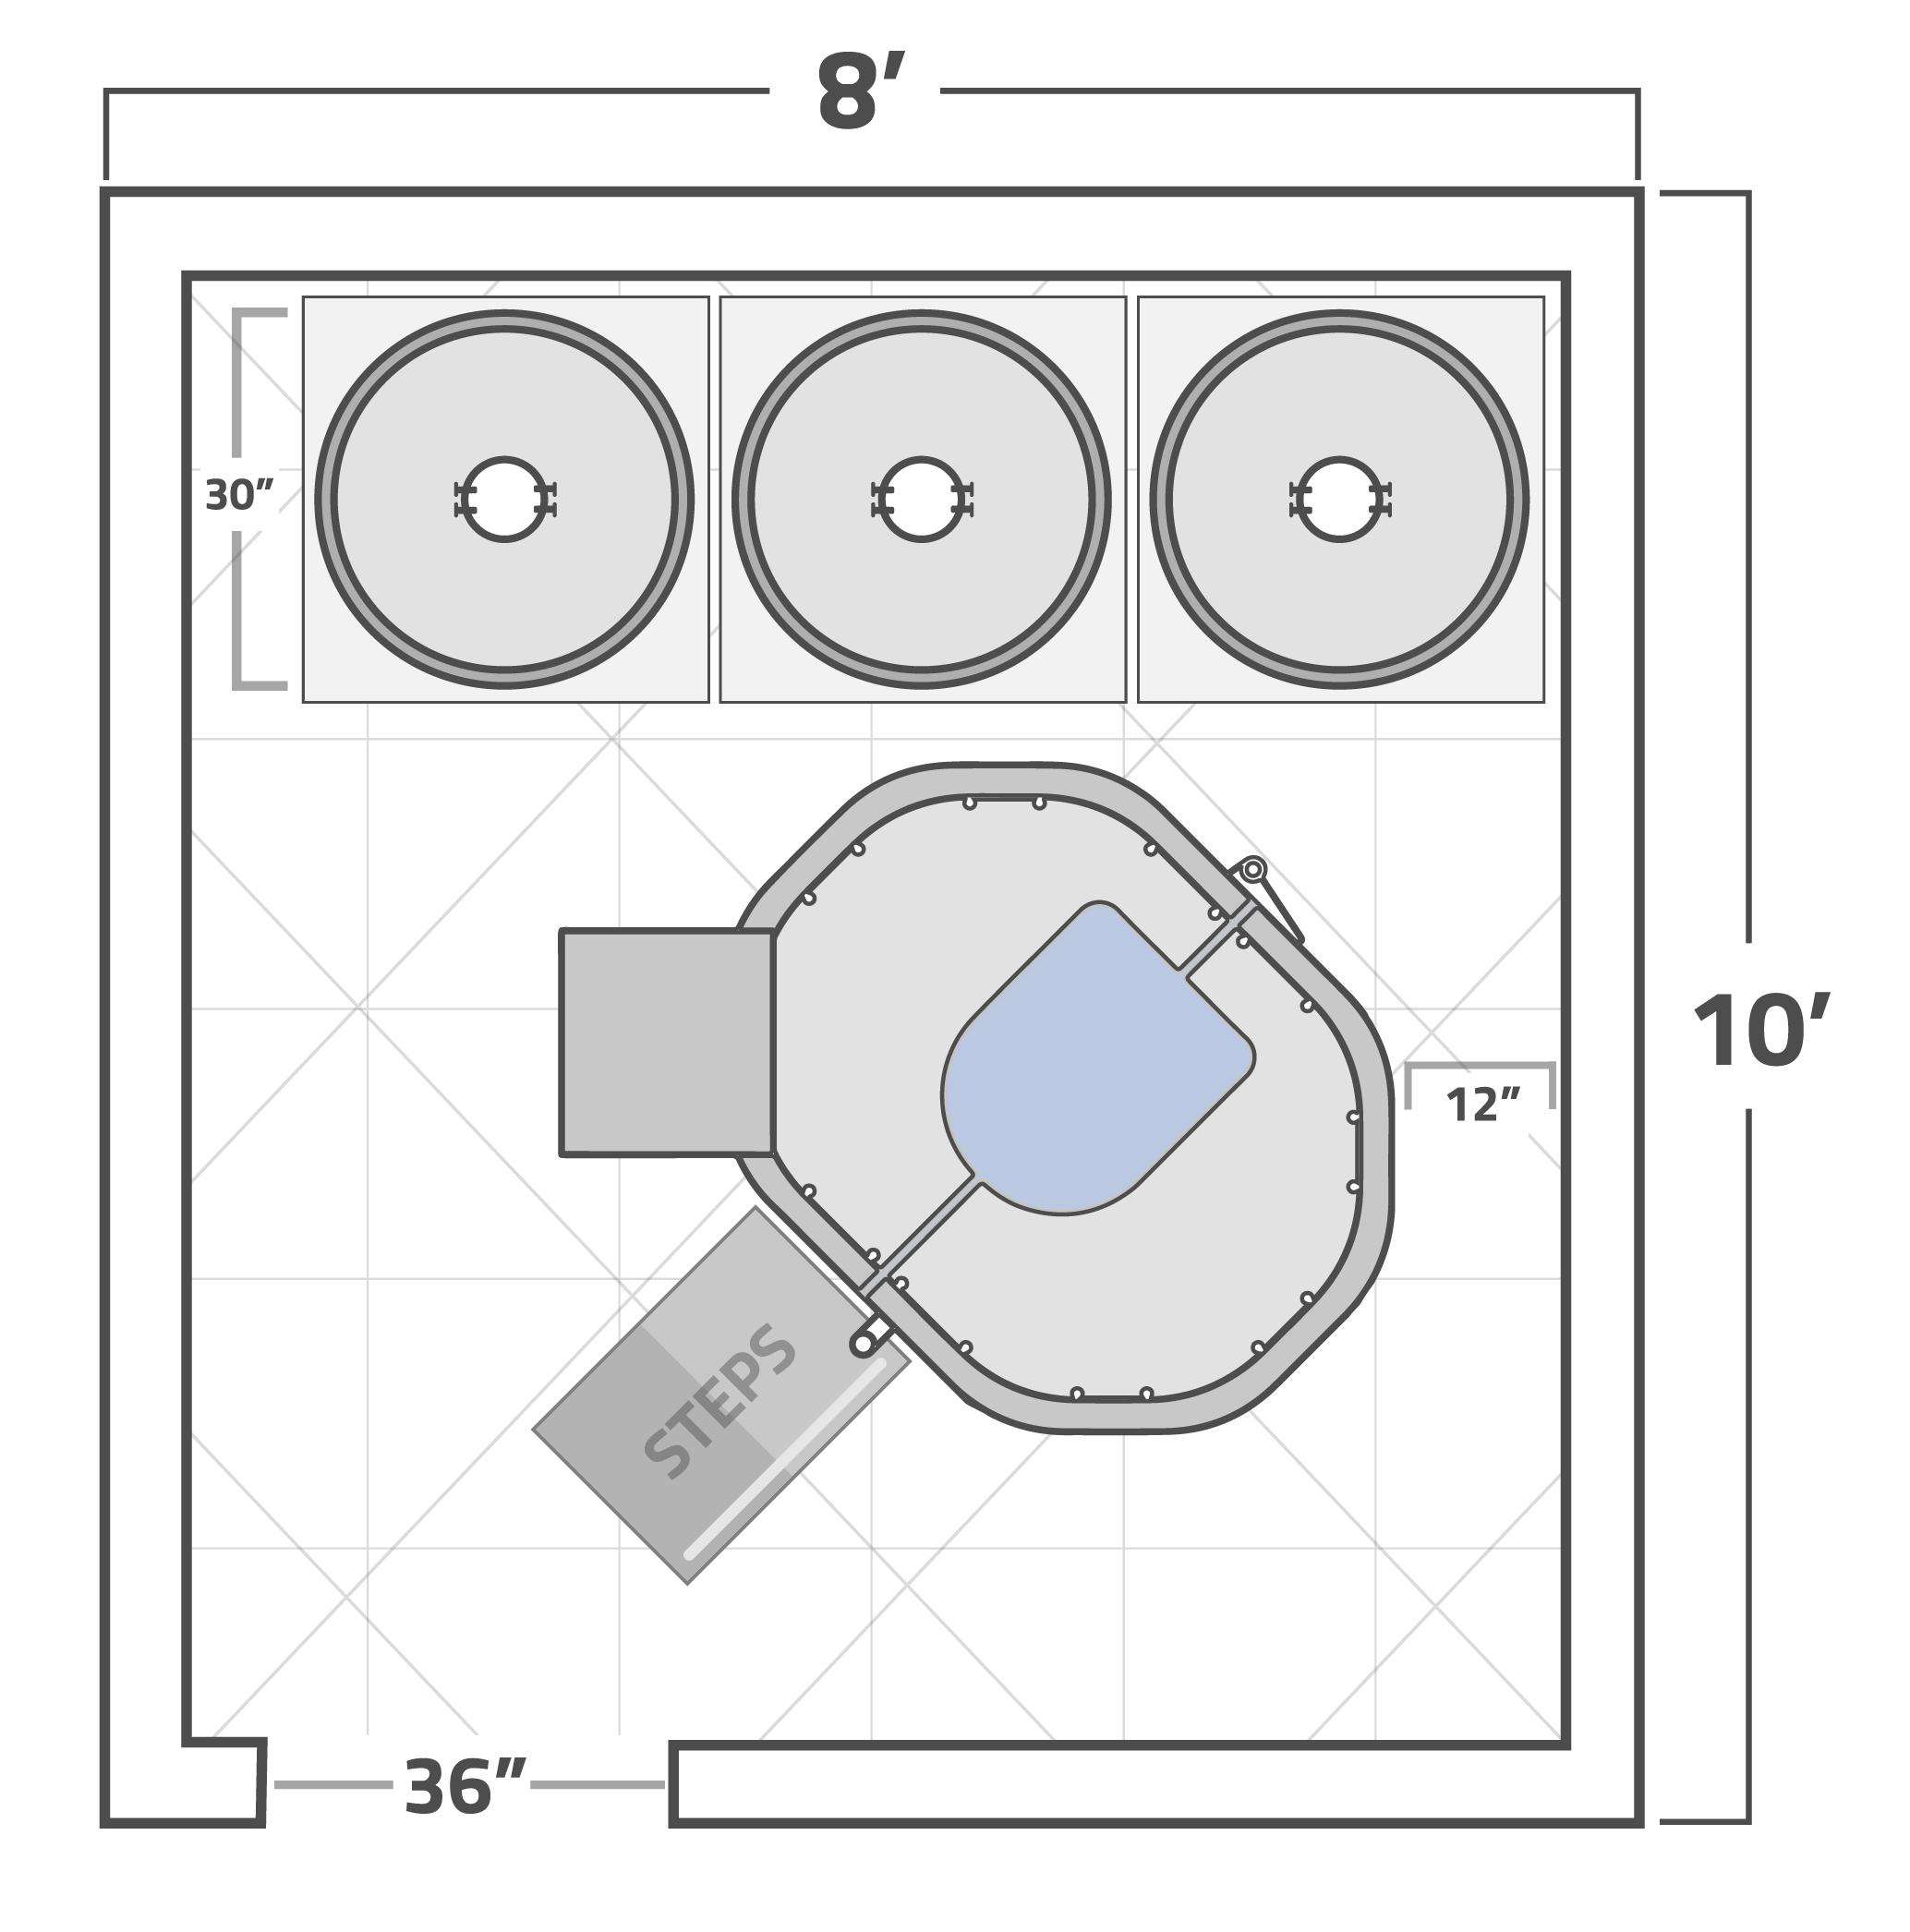 8x10 room.jpg